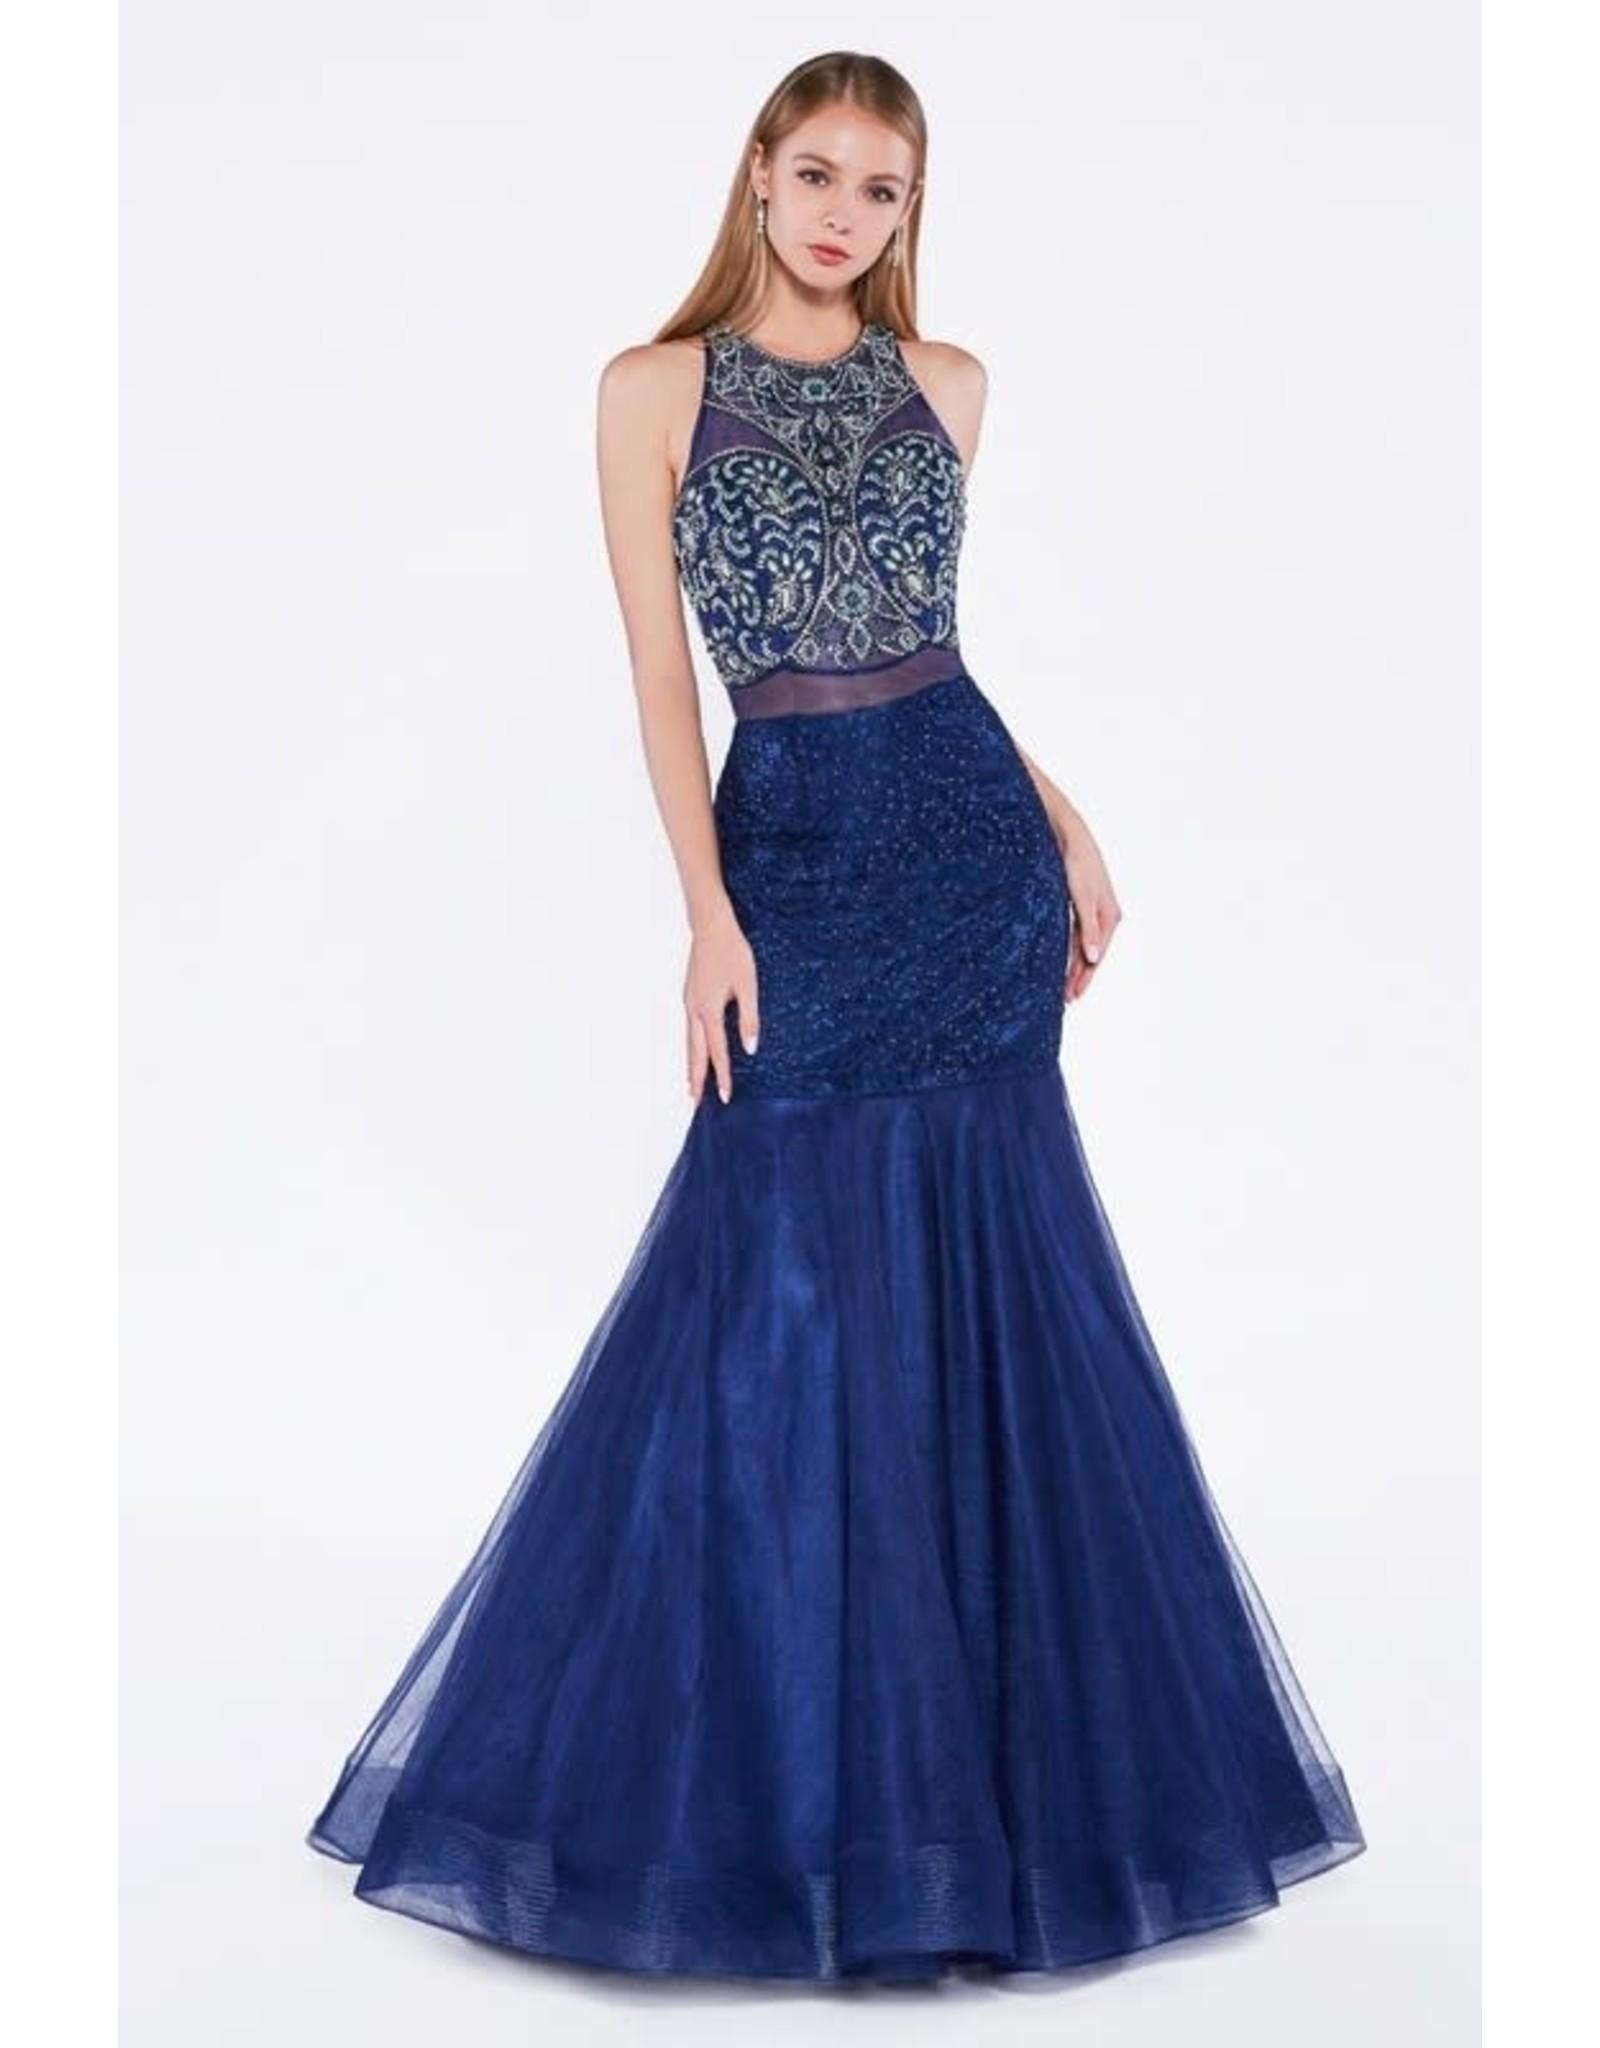 Navy Blue Beaded Prom Dress